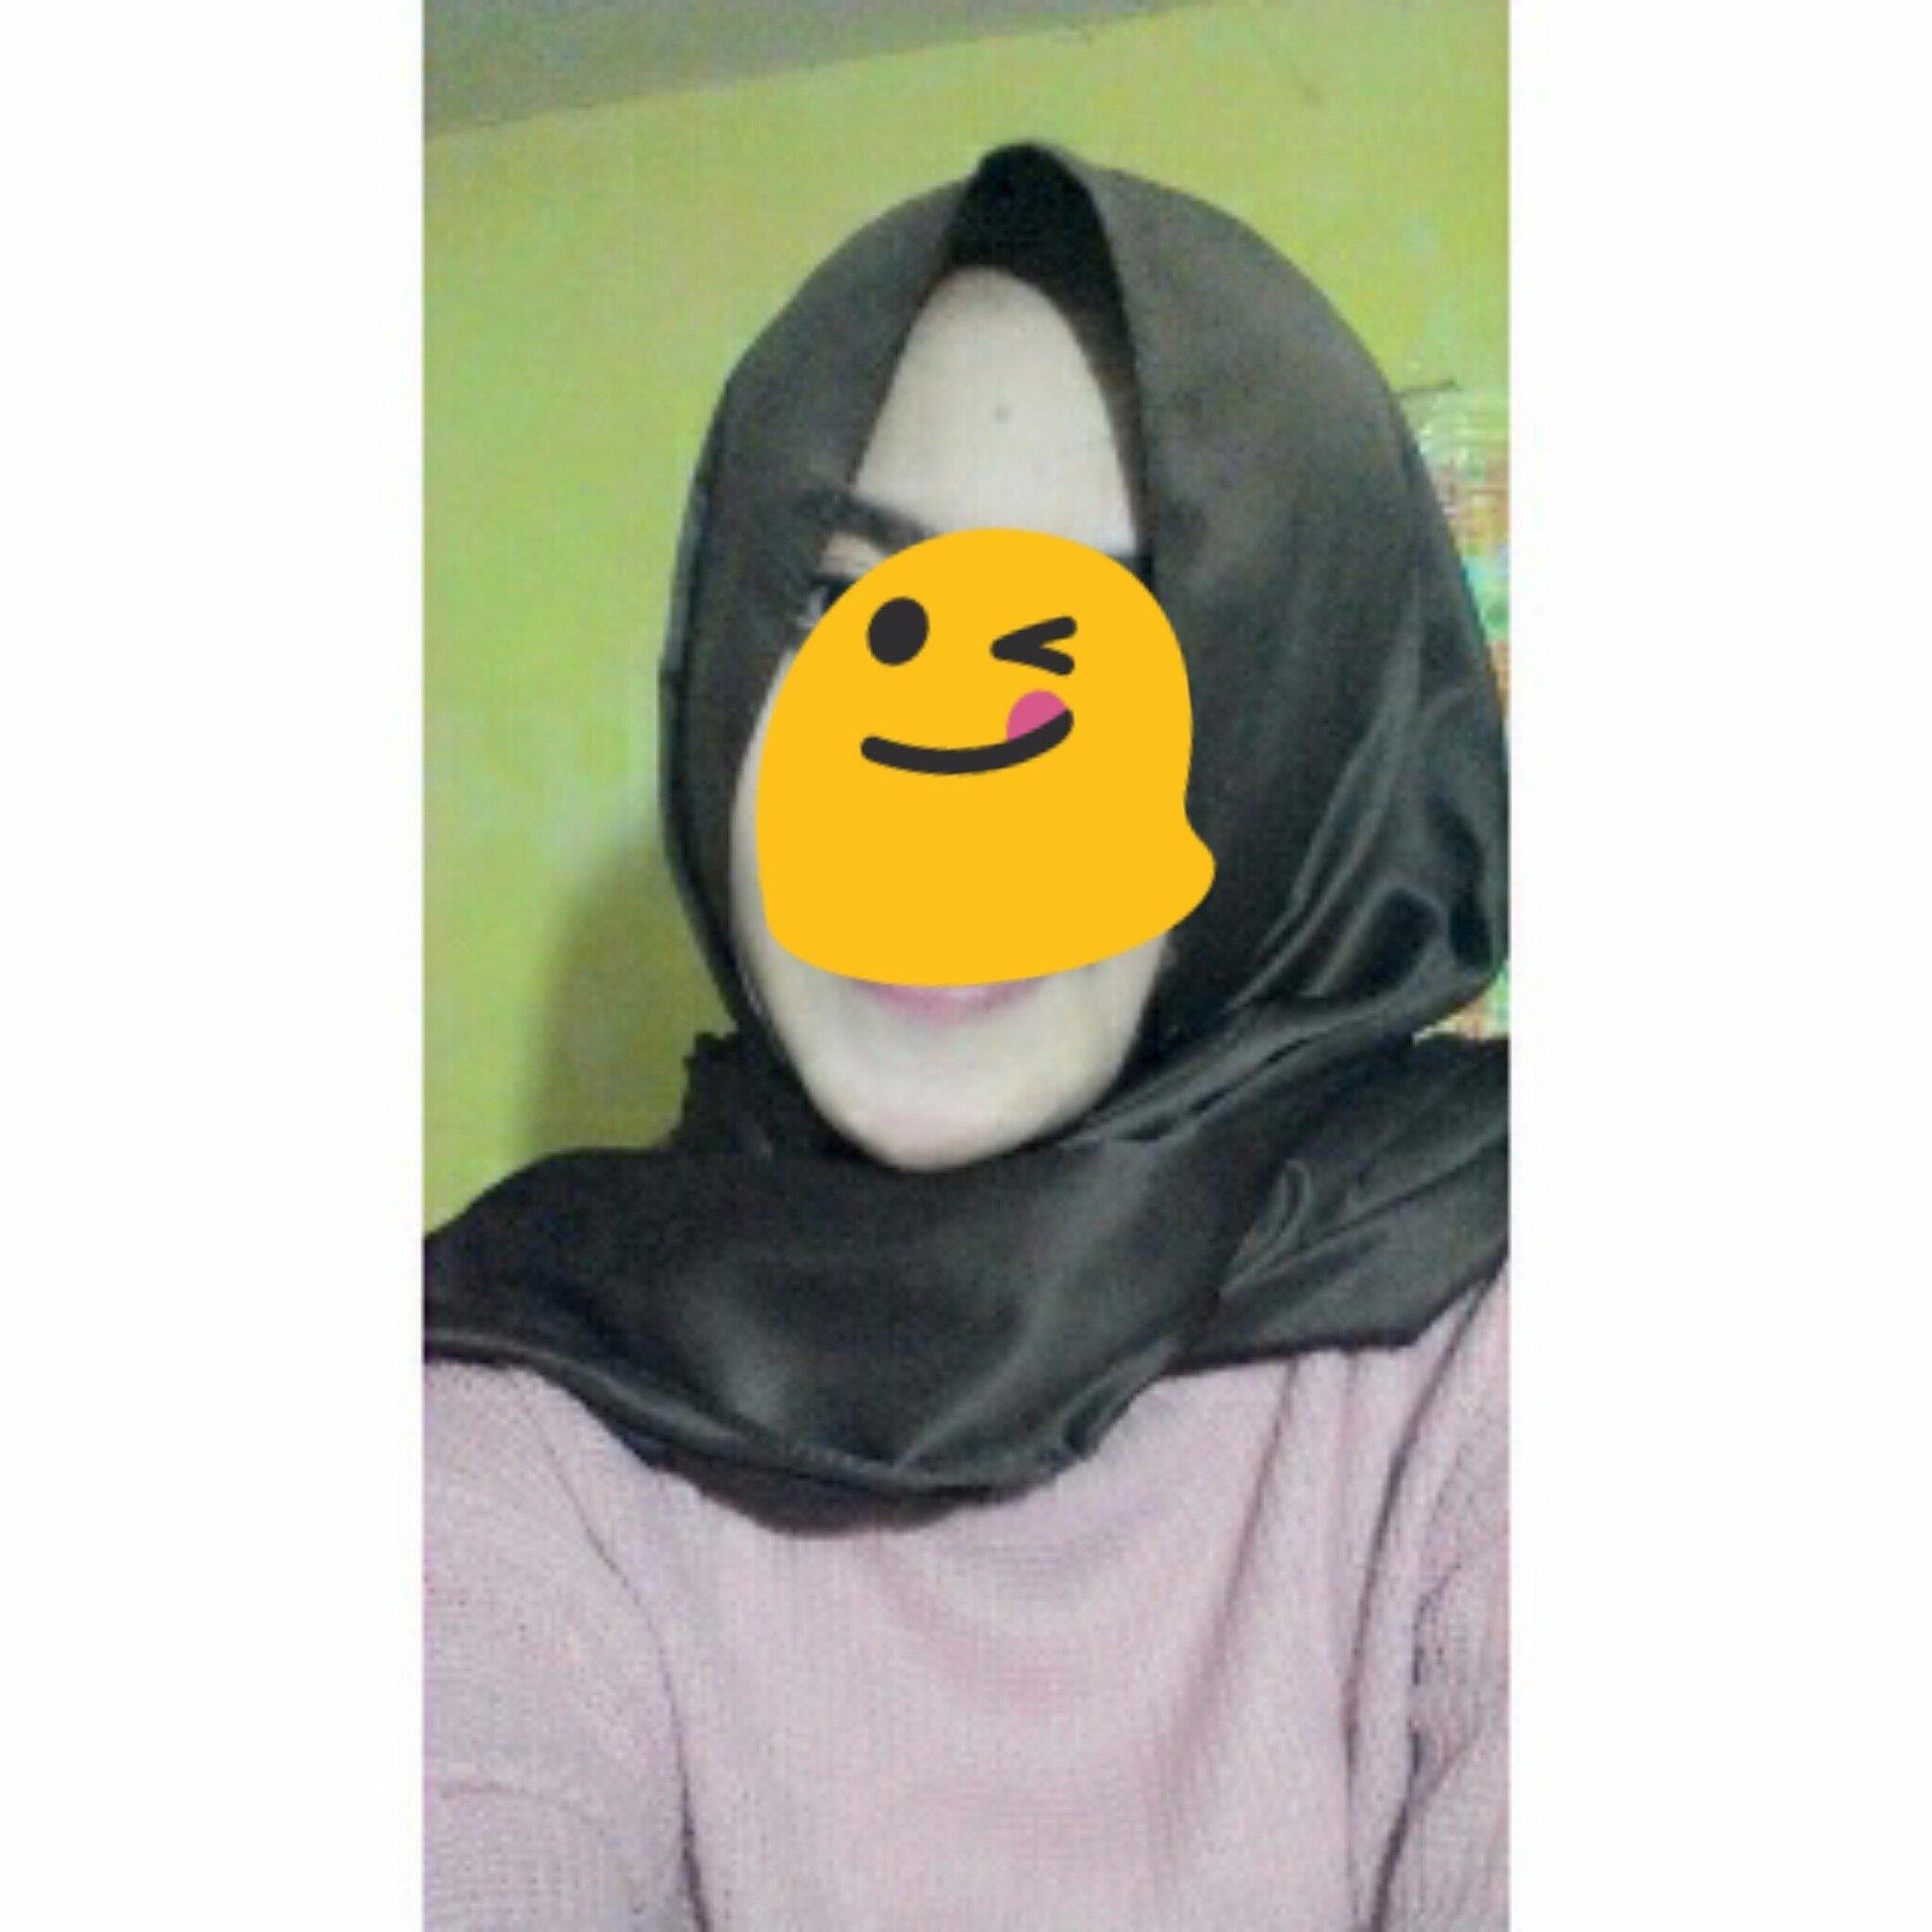 Foto foto cewek hijab ngemut kontol sampai crot phrase simply